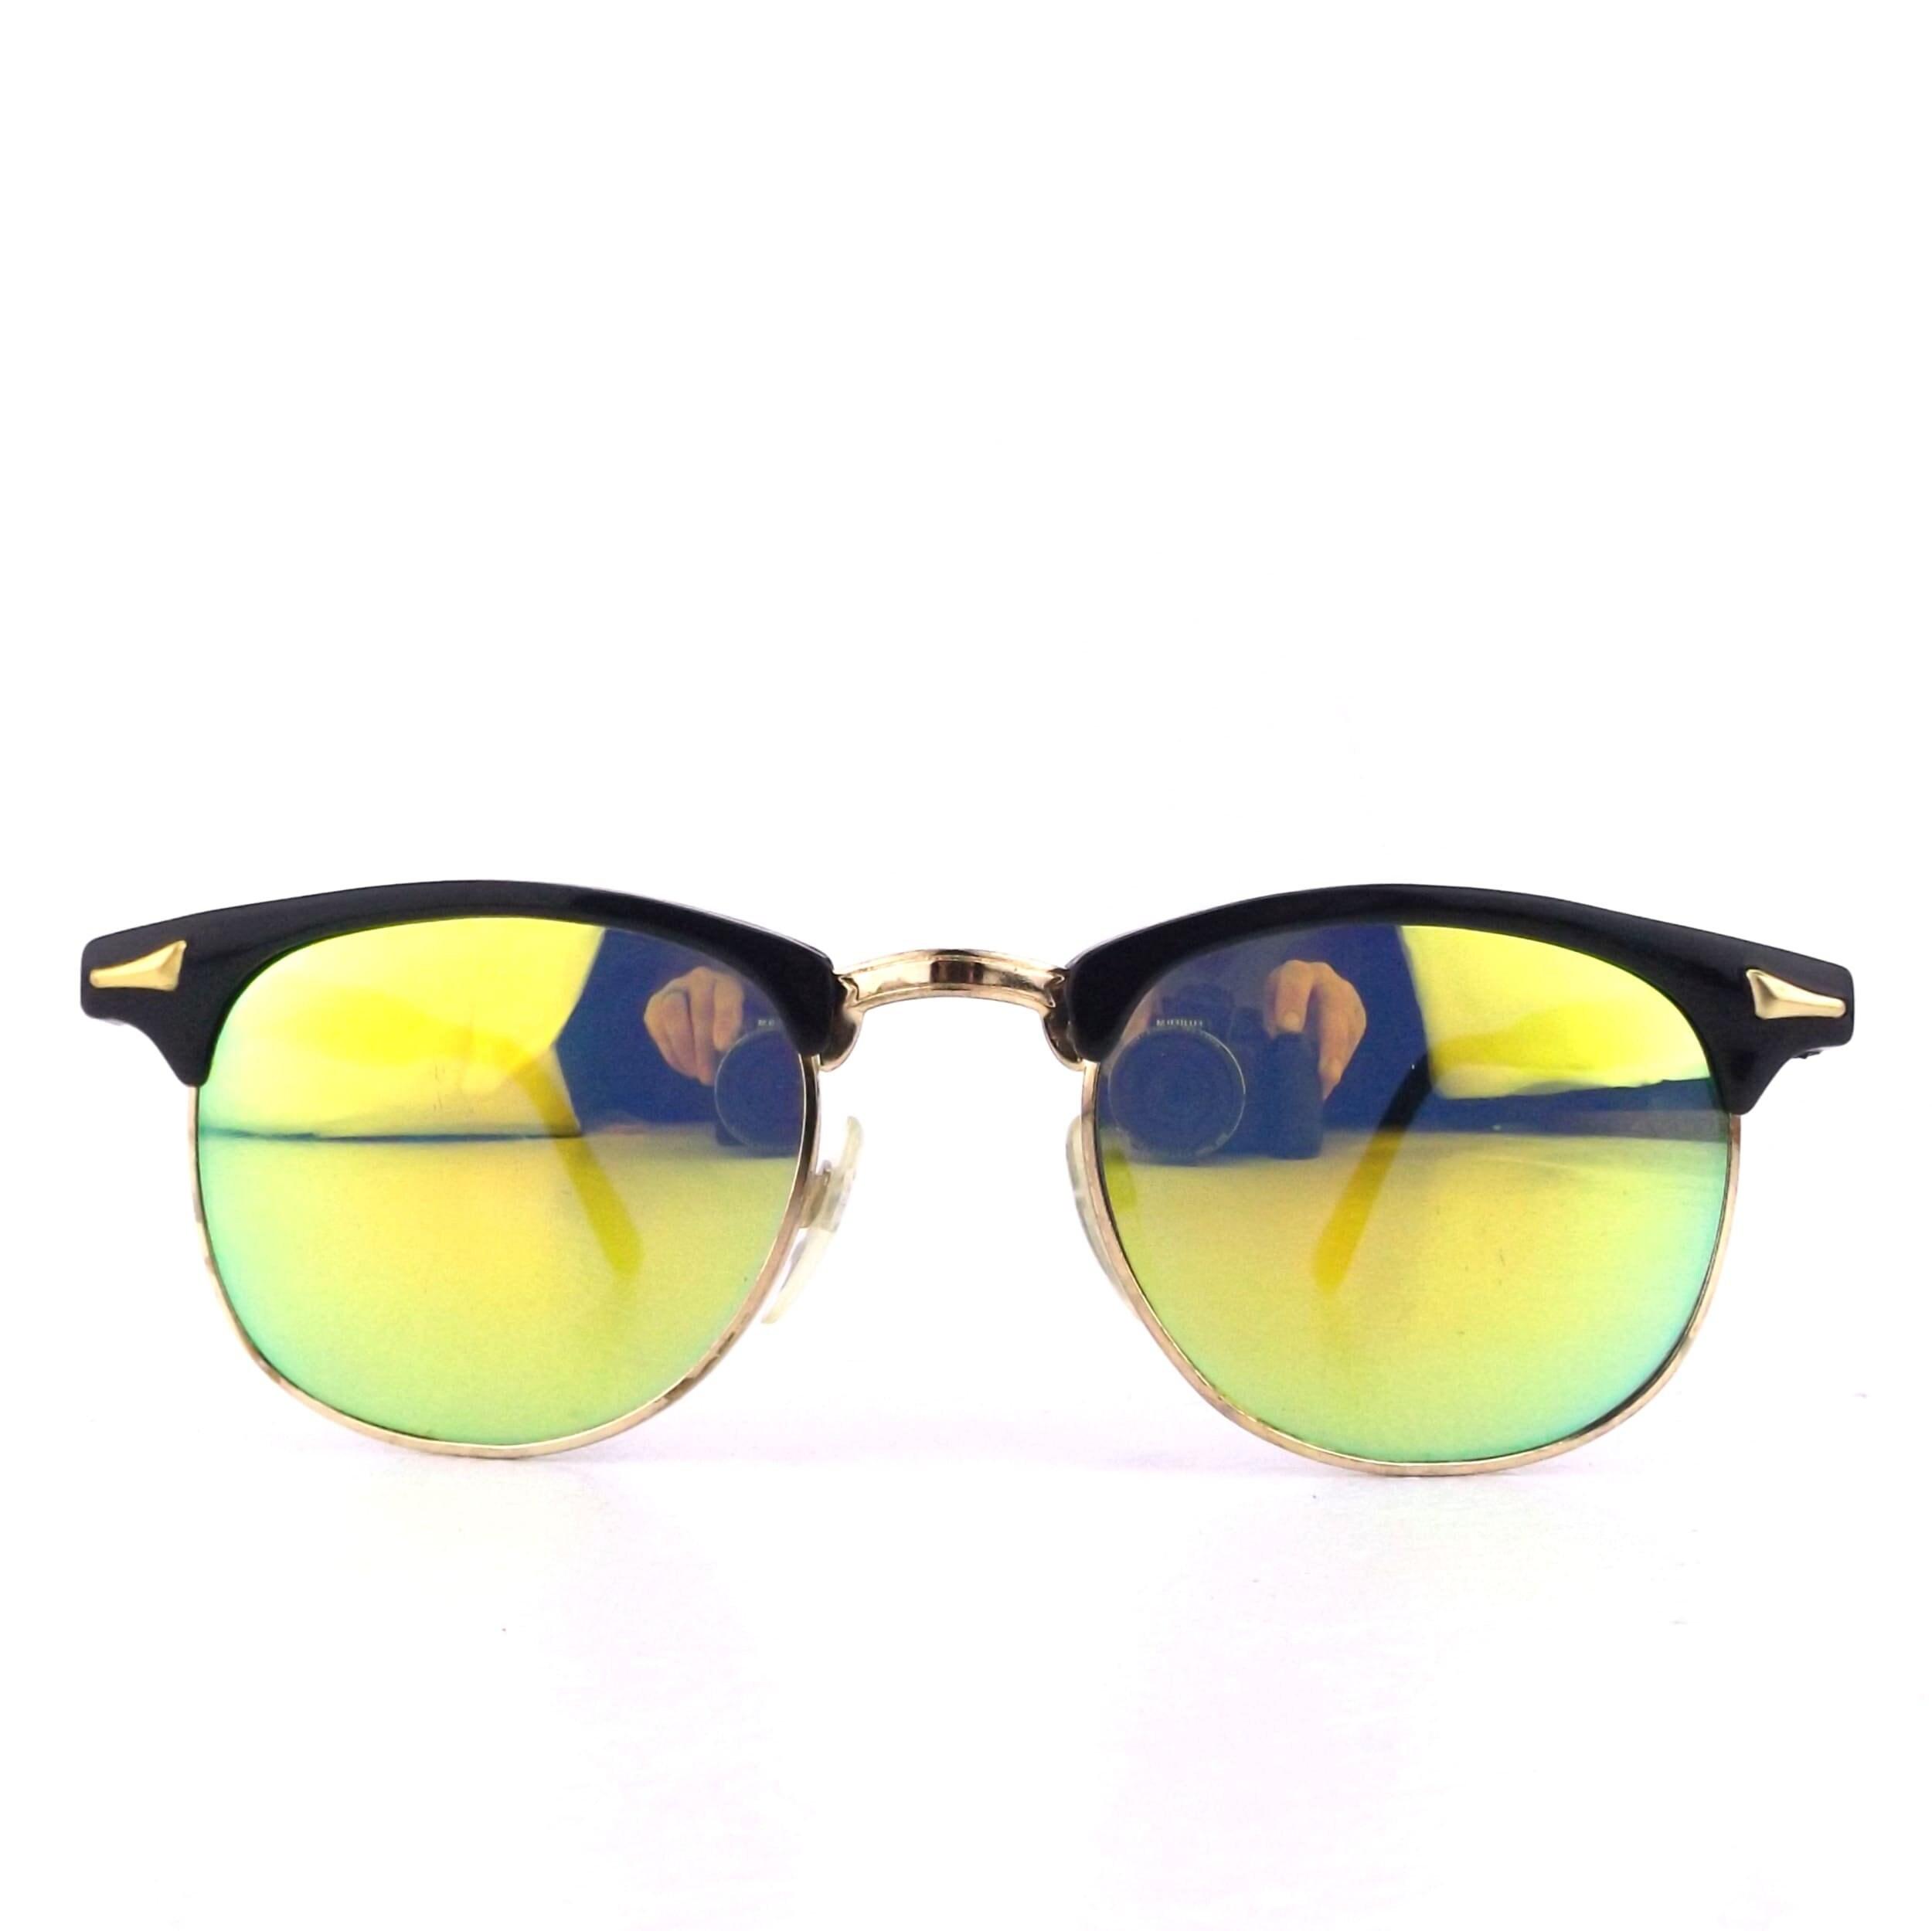 £10 OR LESS VINTAGE 90s deadstock//80s round sunglasses clubmaster tortoiseshell